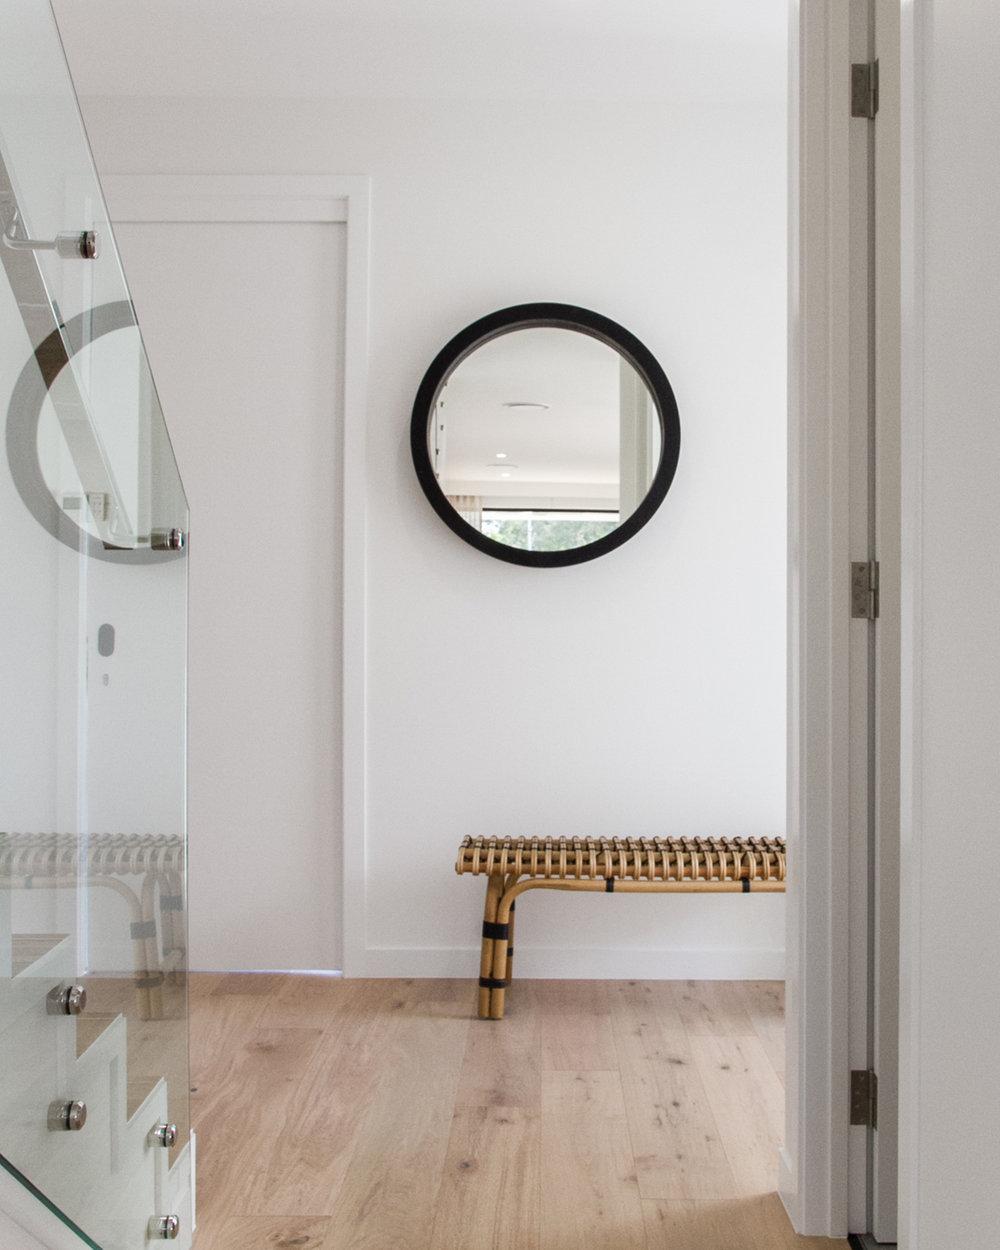 Kira and Kira - Gold Coast Property Styling - Home Interiors - Furniture DesignKira and Kira Gold Coast Property Styling Home Furniture IMG_6125 - small.jpg